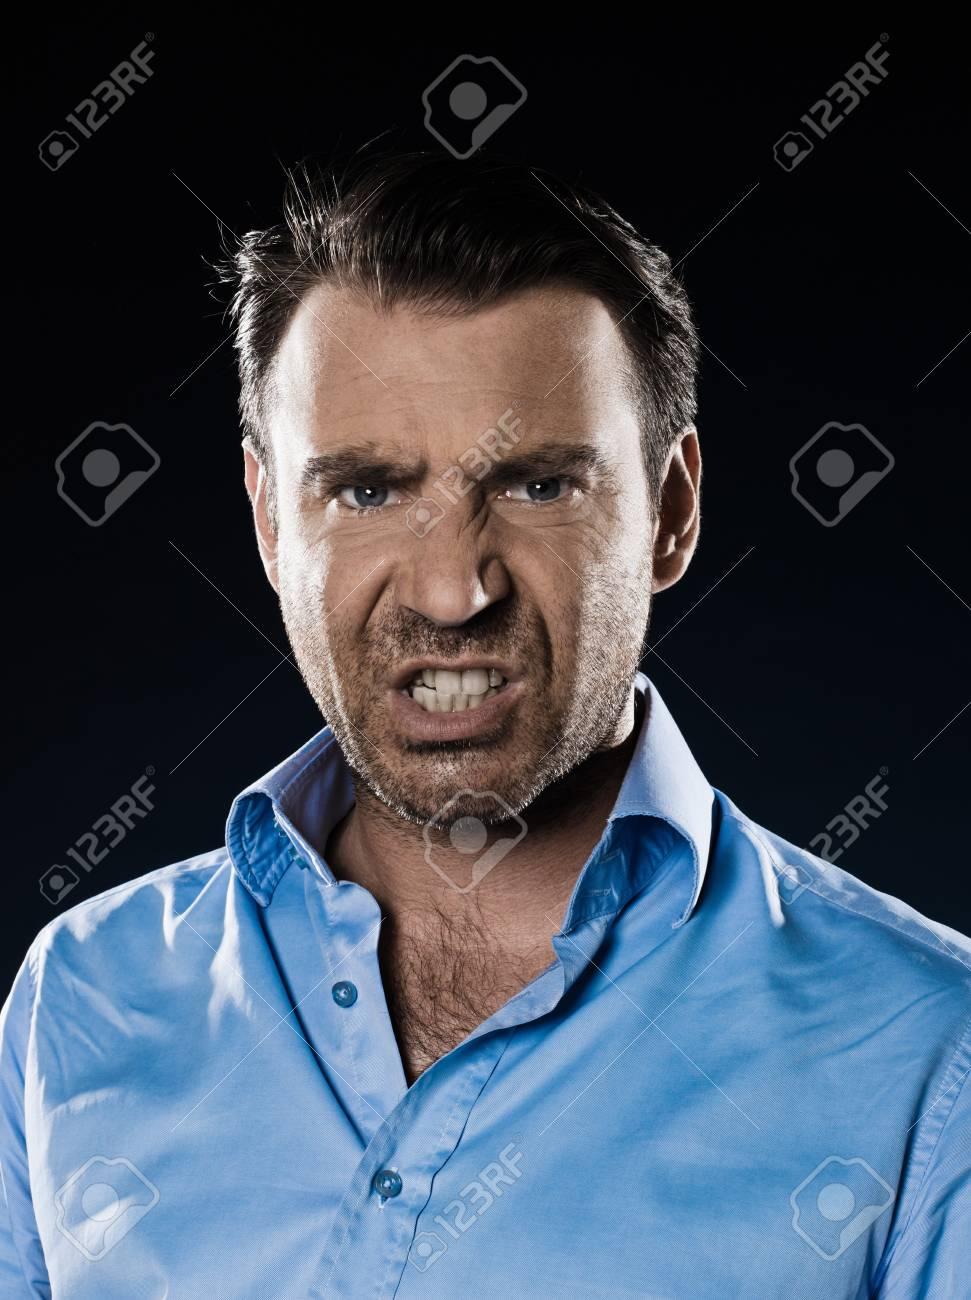 caucasian man unshaven pucker anger portrait isolated studio on black background Stock Photo - 15641305